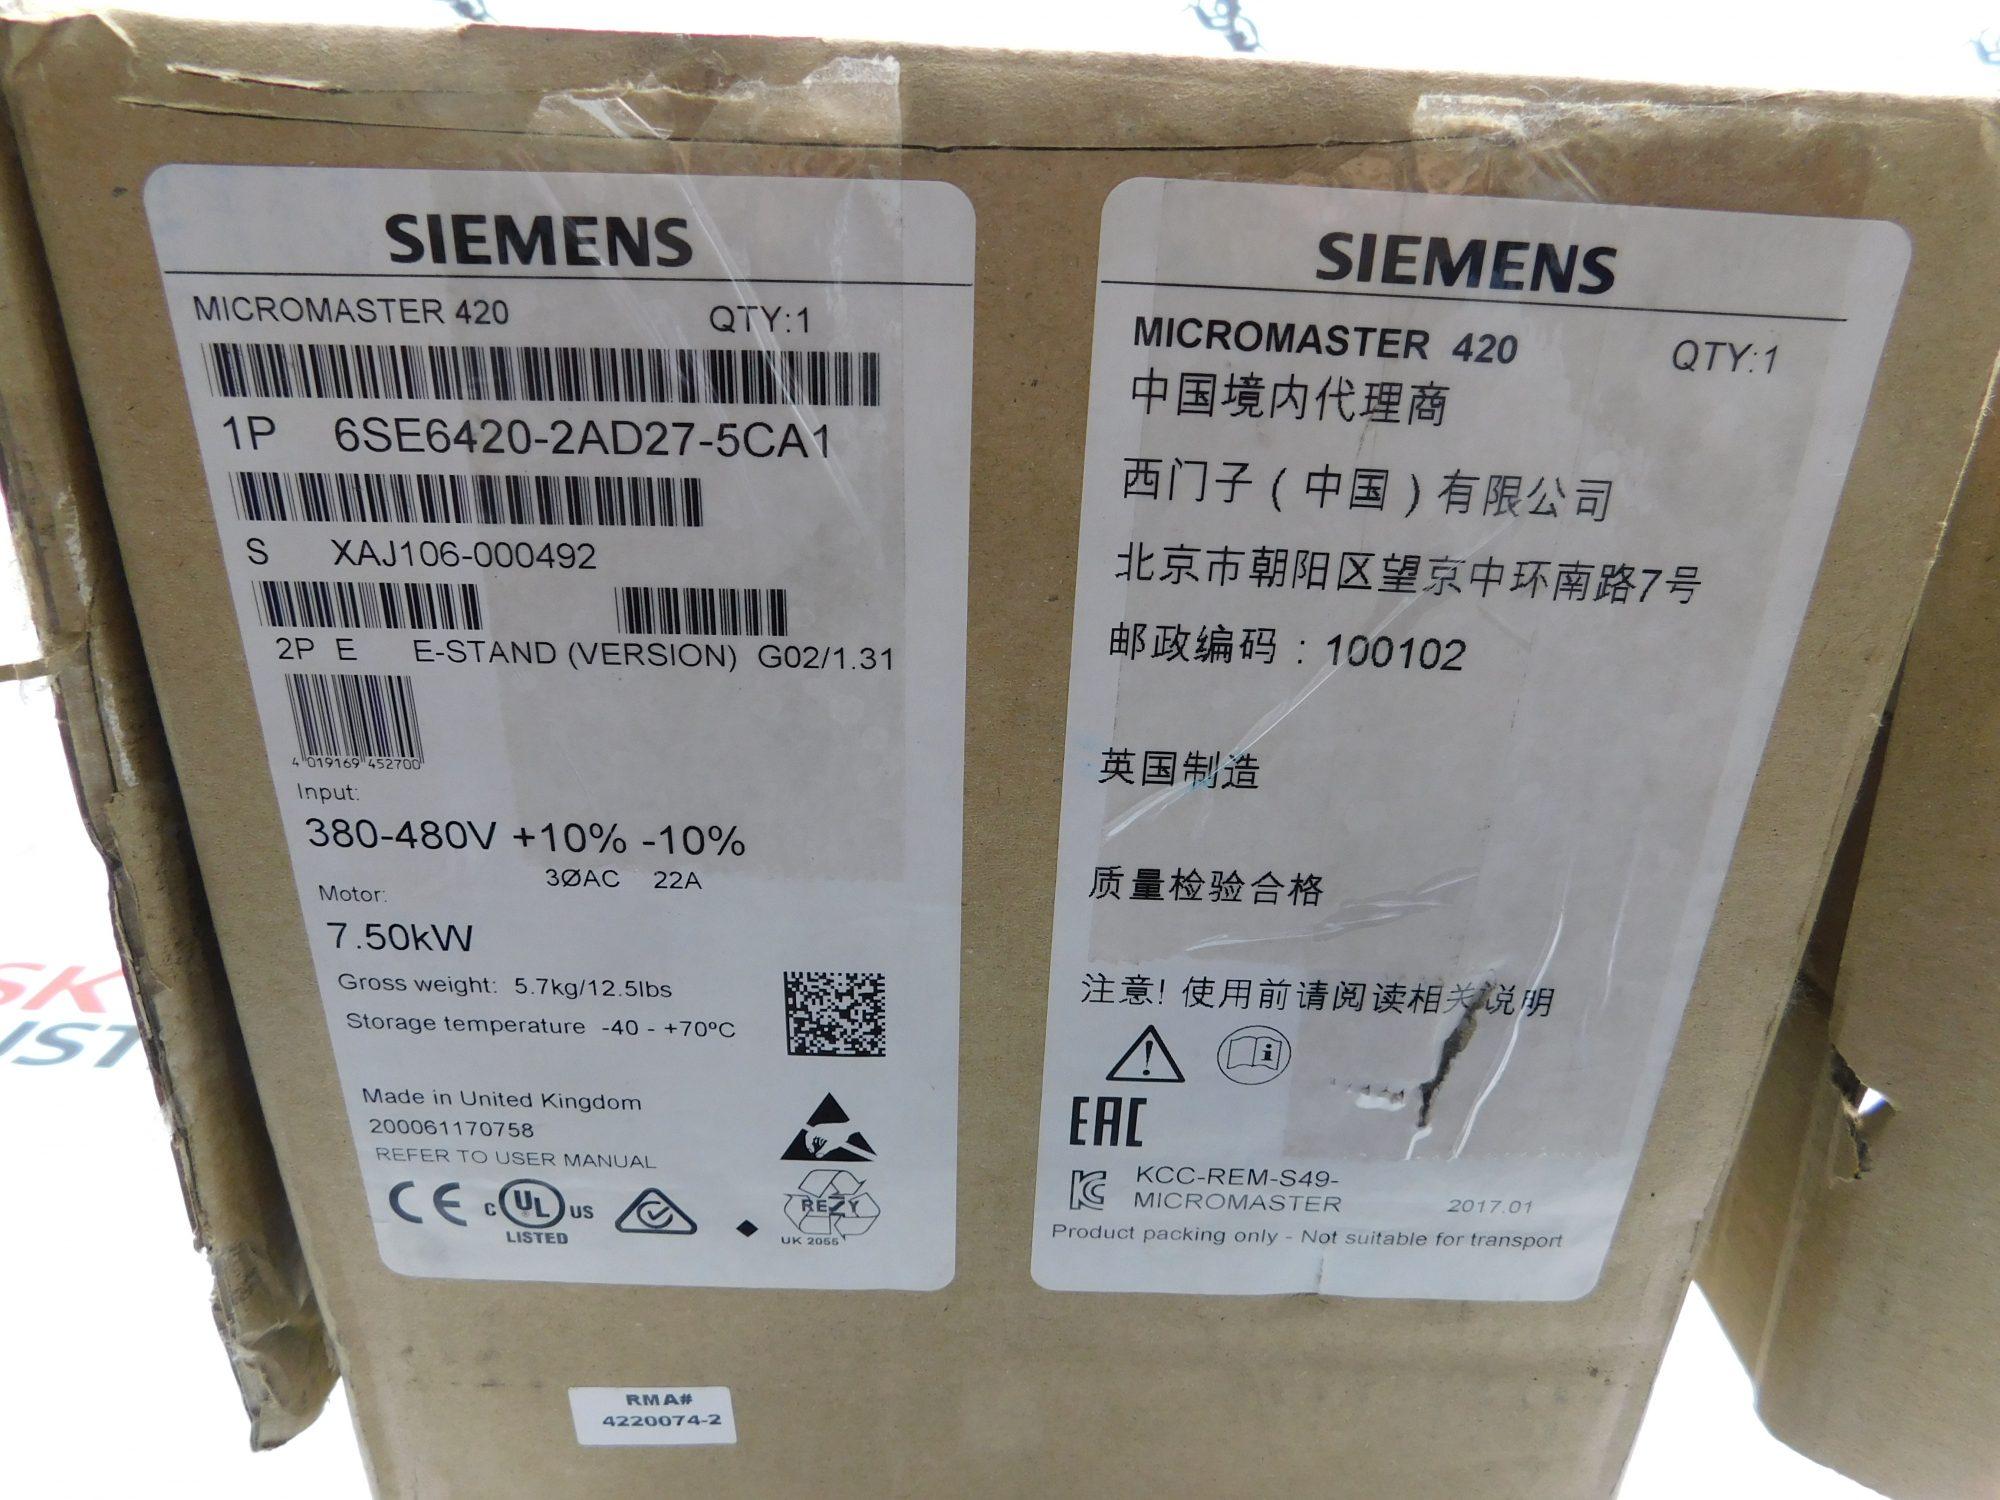 Siemens MicroMaster 420 6SE6420-2AD27-5CA1 380-480V 7.50kW Motor